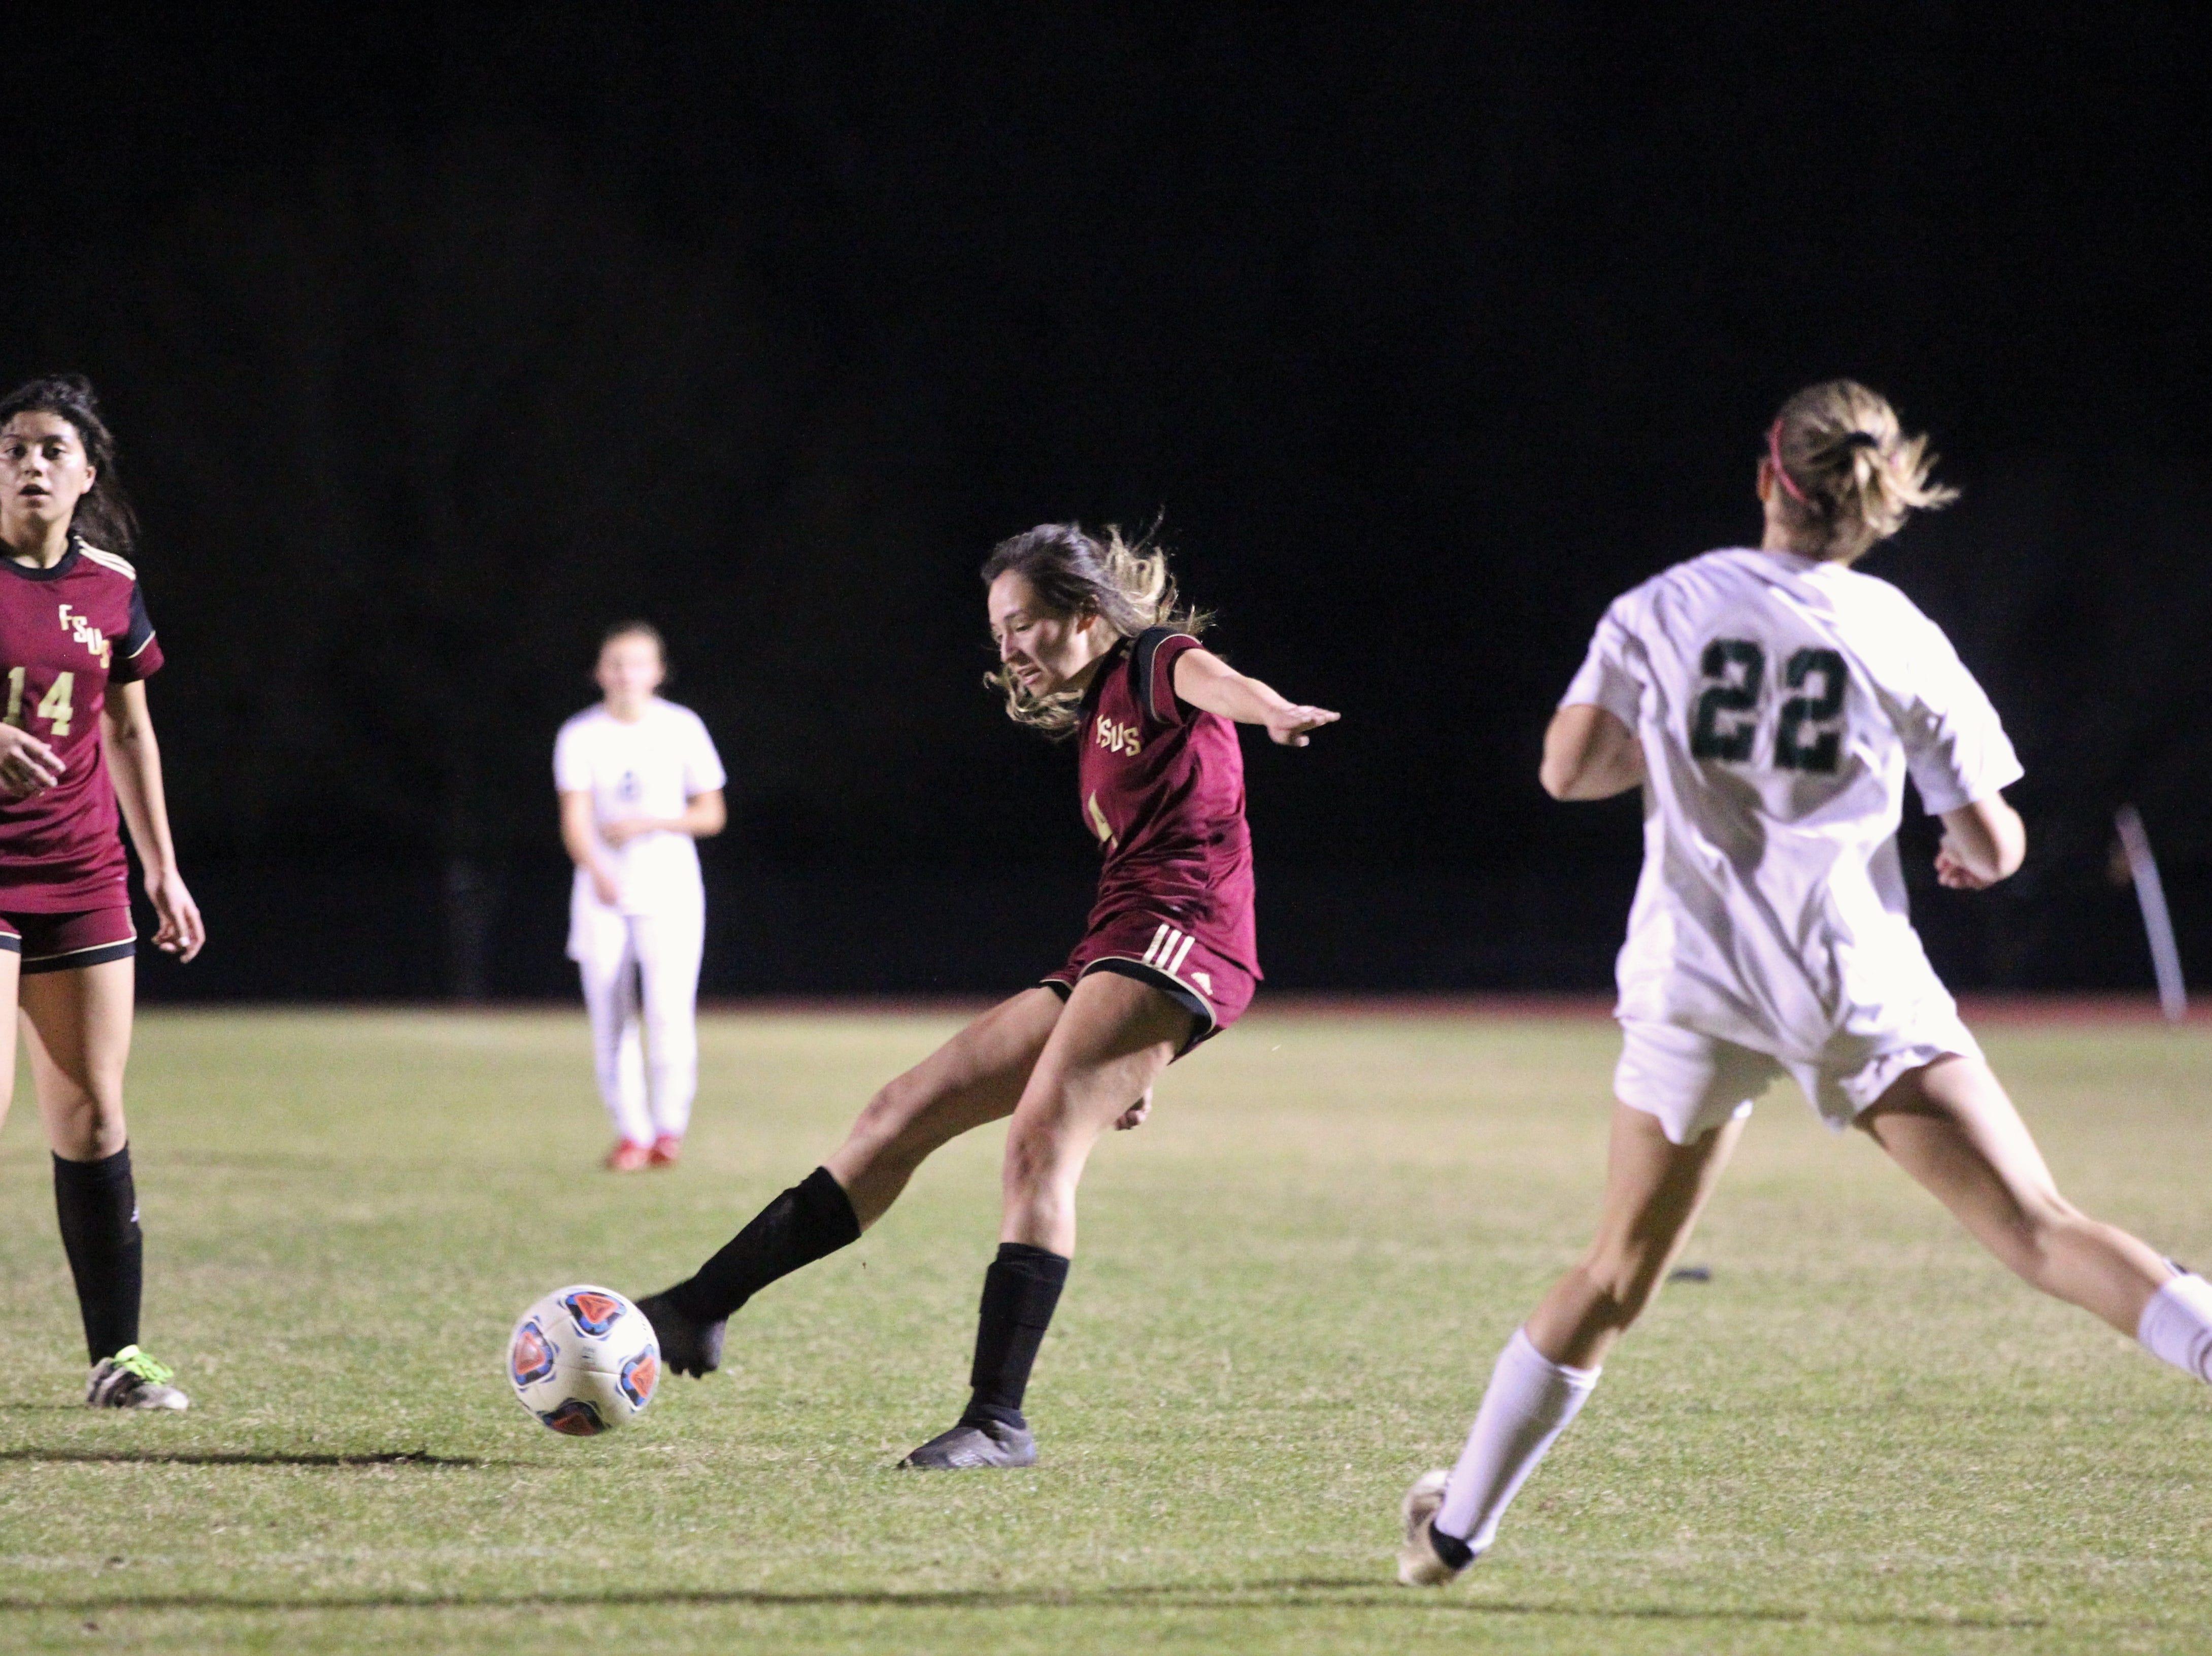 Florida High's Daphne Cervantes passes ahead as South Walton's girls soccer team edged the Seminoles 5-4 in a penalty-kick shootout during a Region 1-2A semifinal on Feb. 8, 2019.